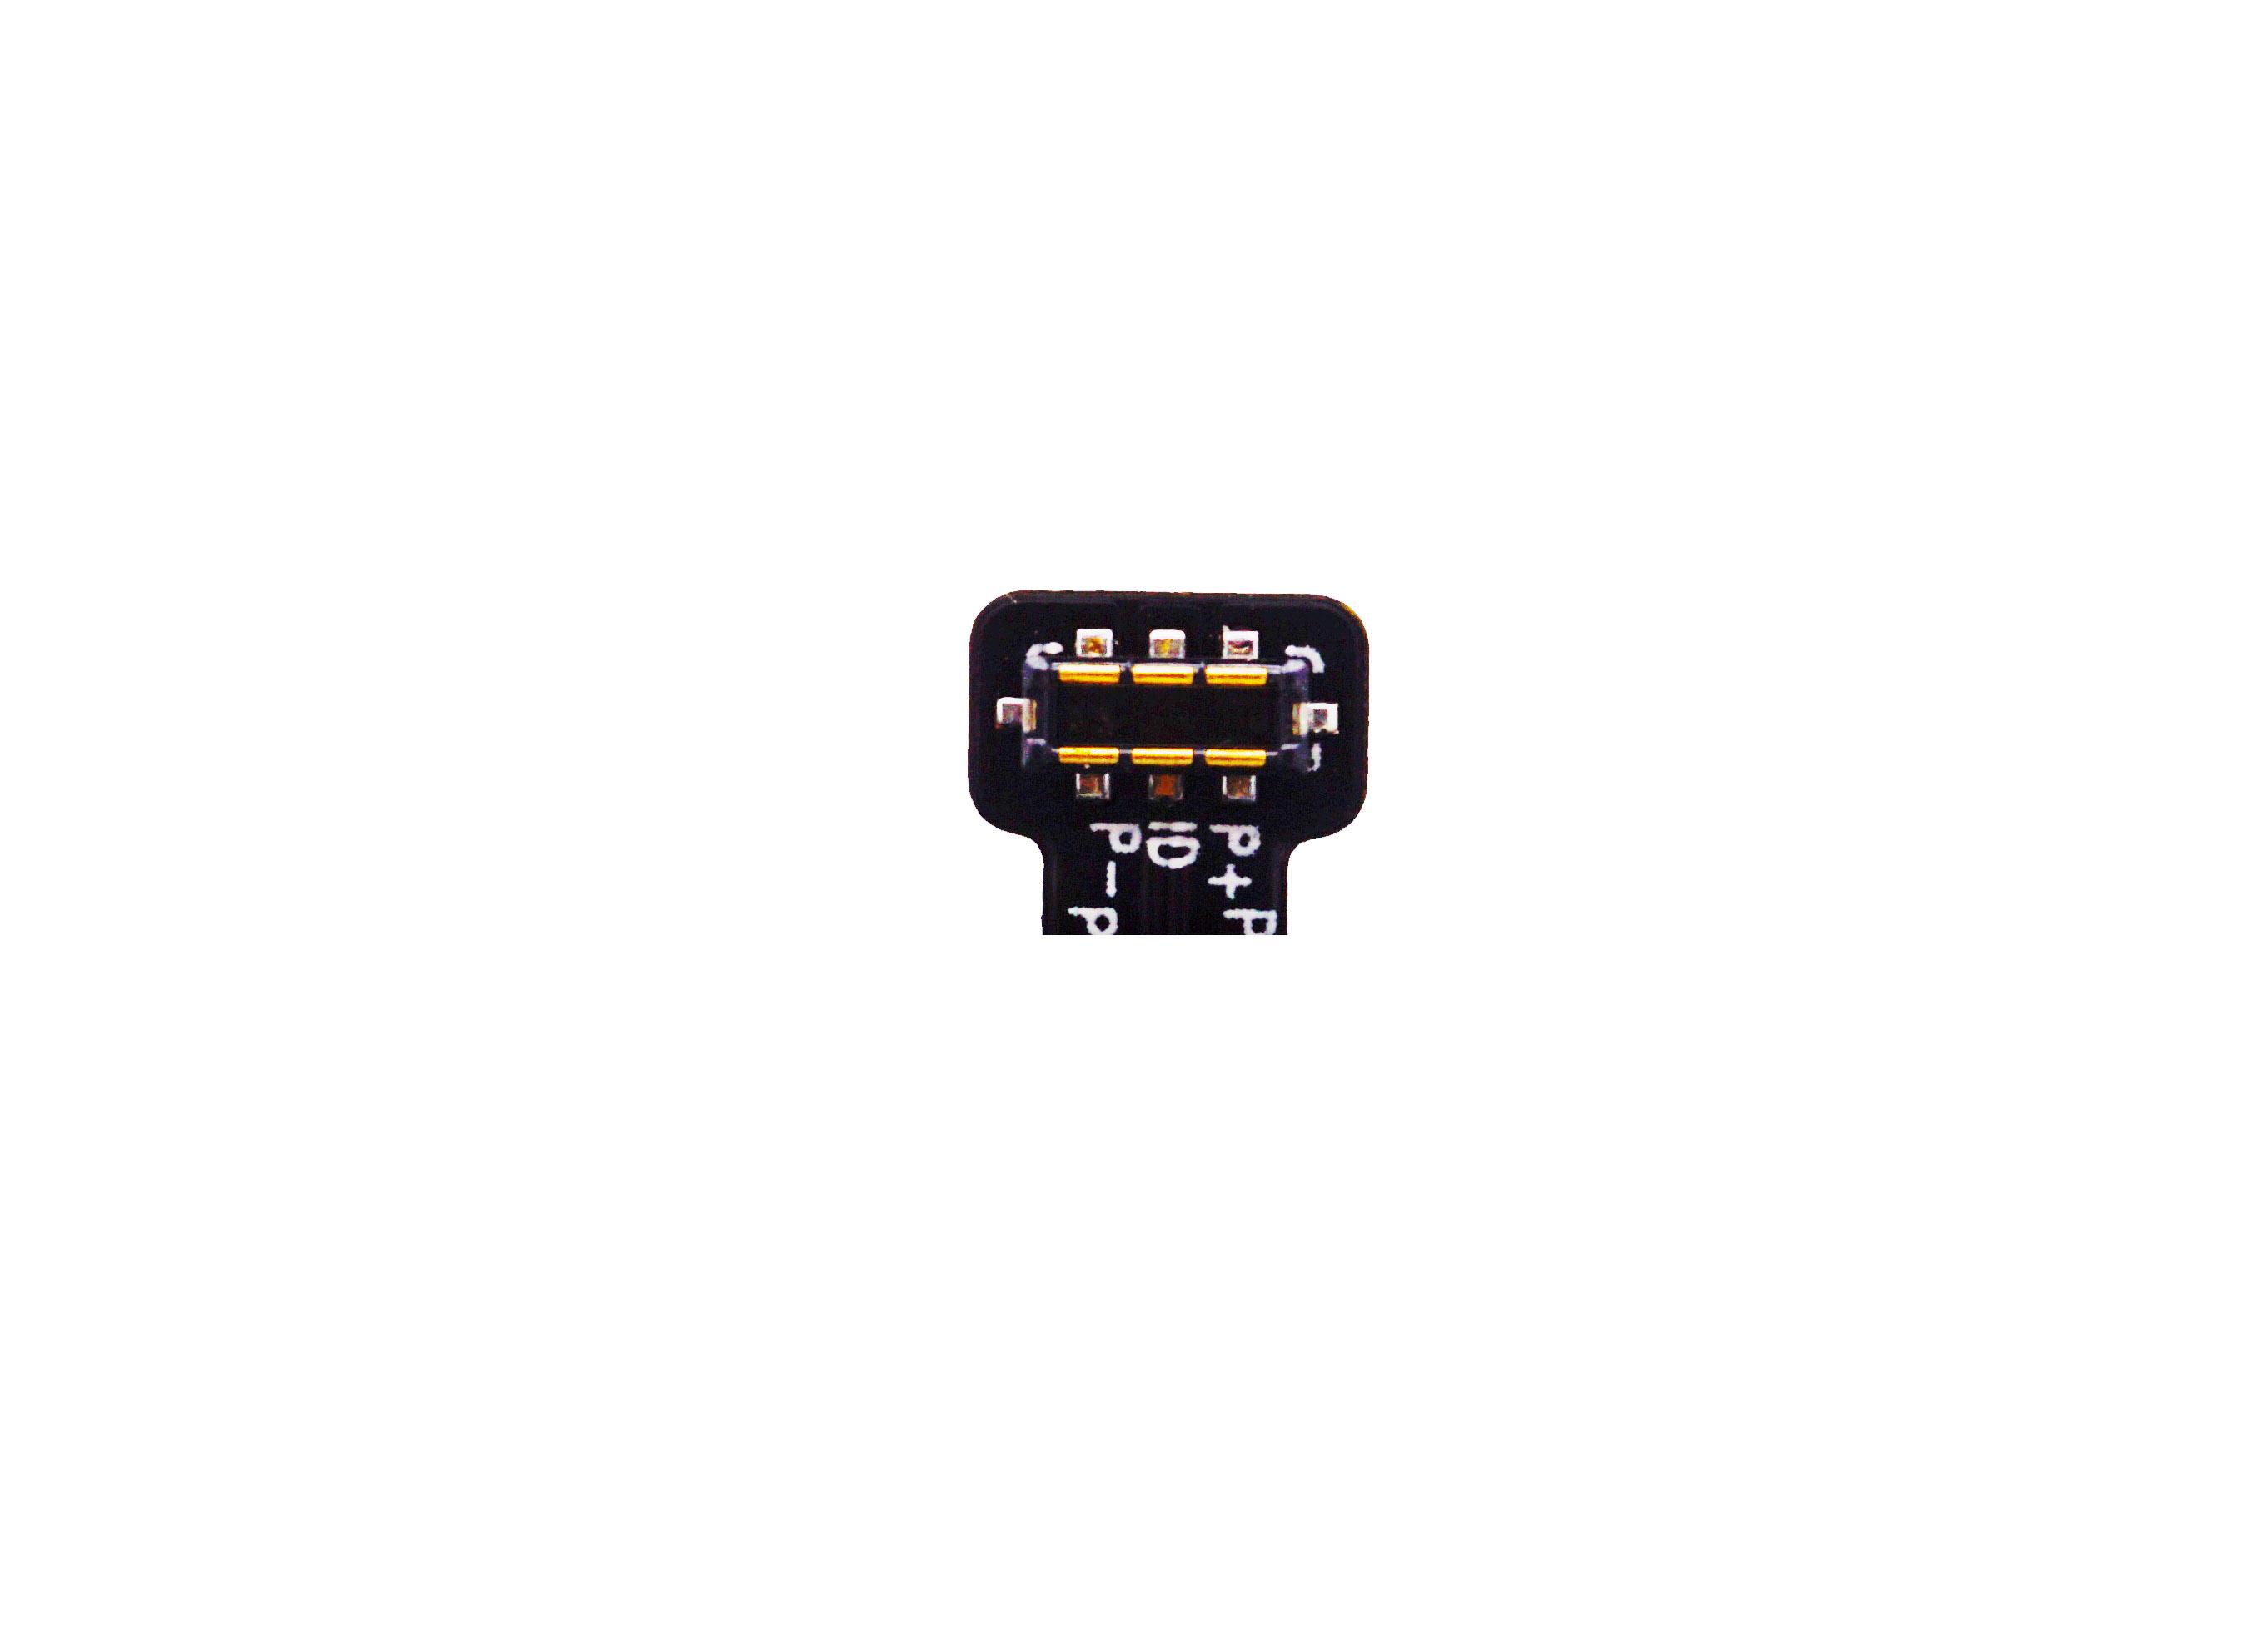 Battery-for-Oppo-A53-Global-Dual-SIM-BLP601-Li-Polymer-NEW thumbnail 6